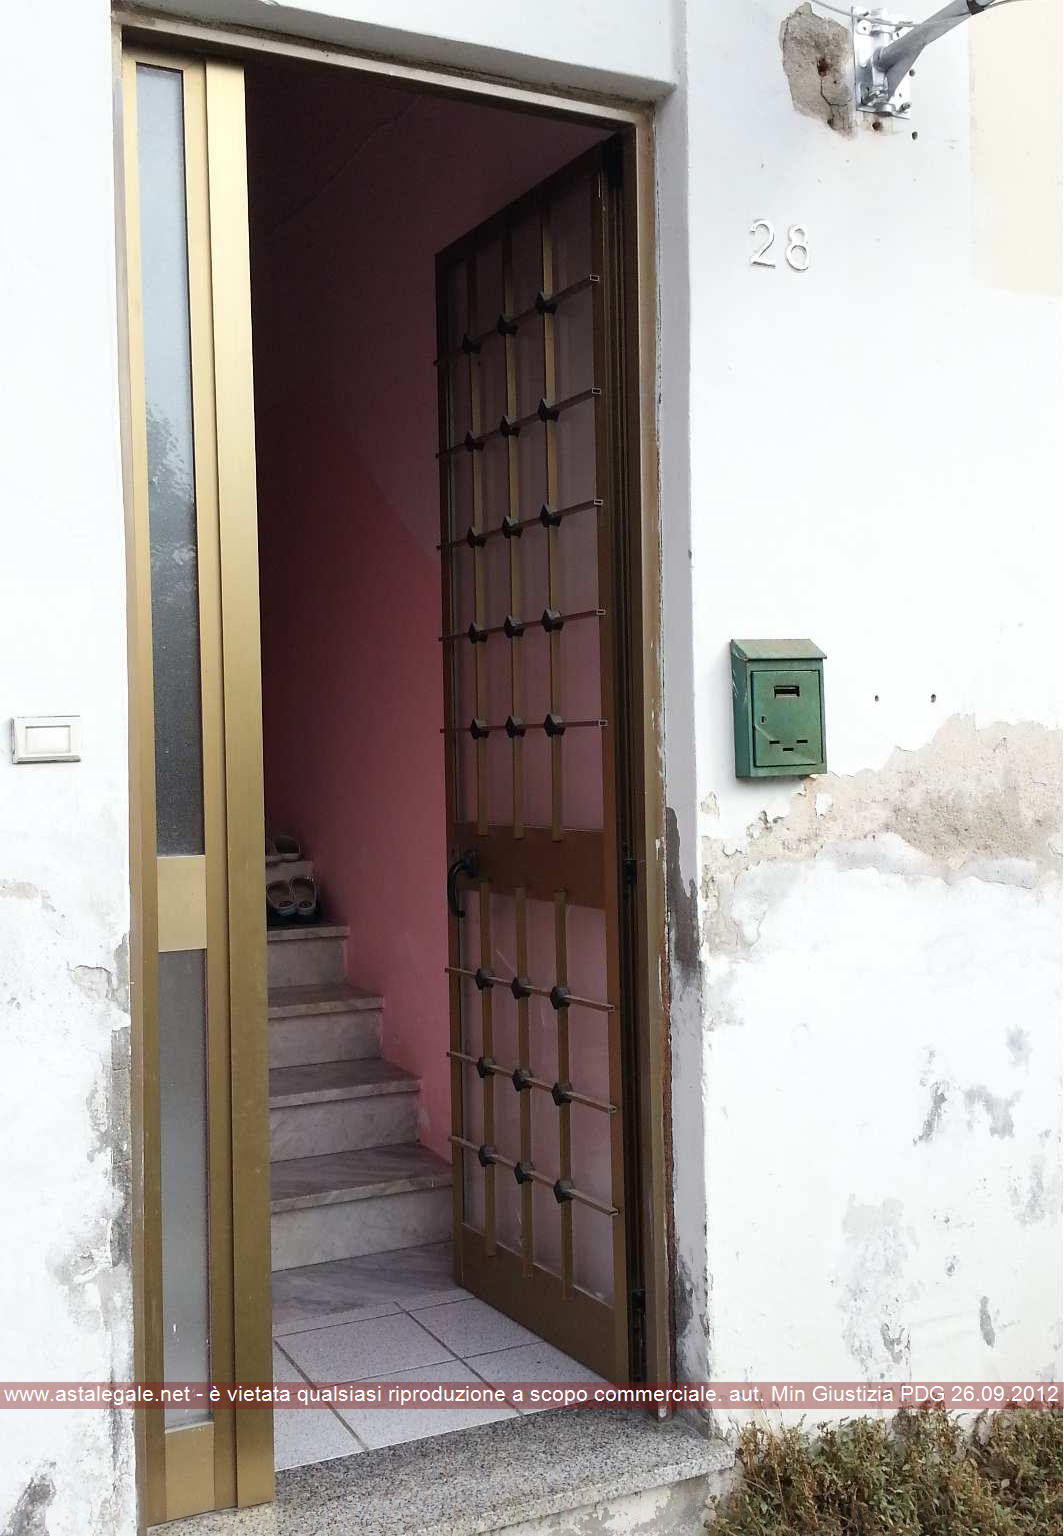 Biella (BI) Via Serpentiero 28